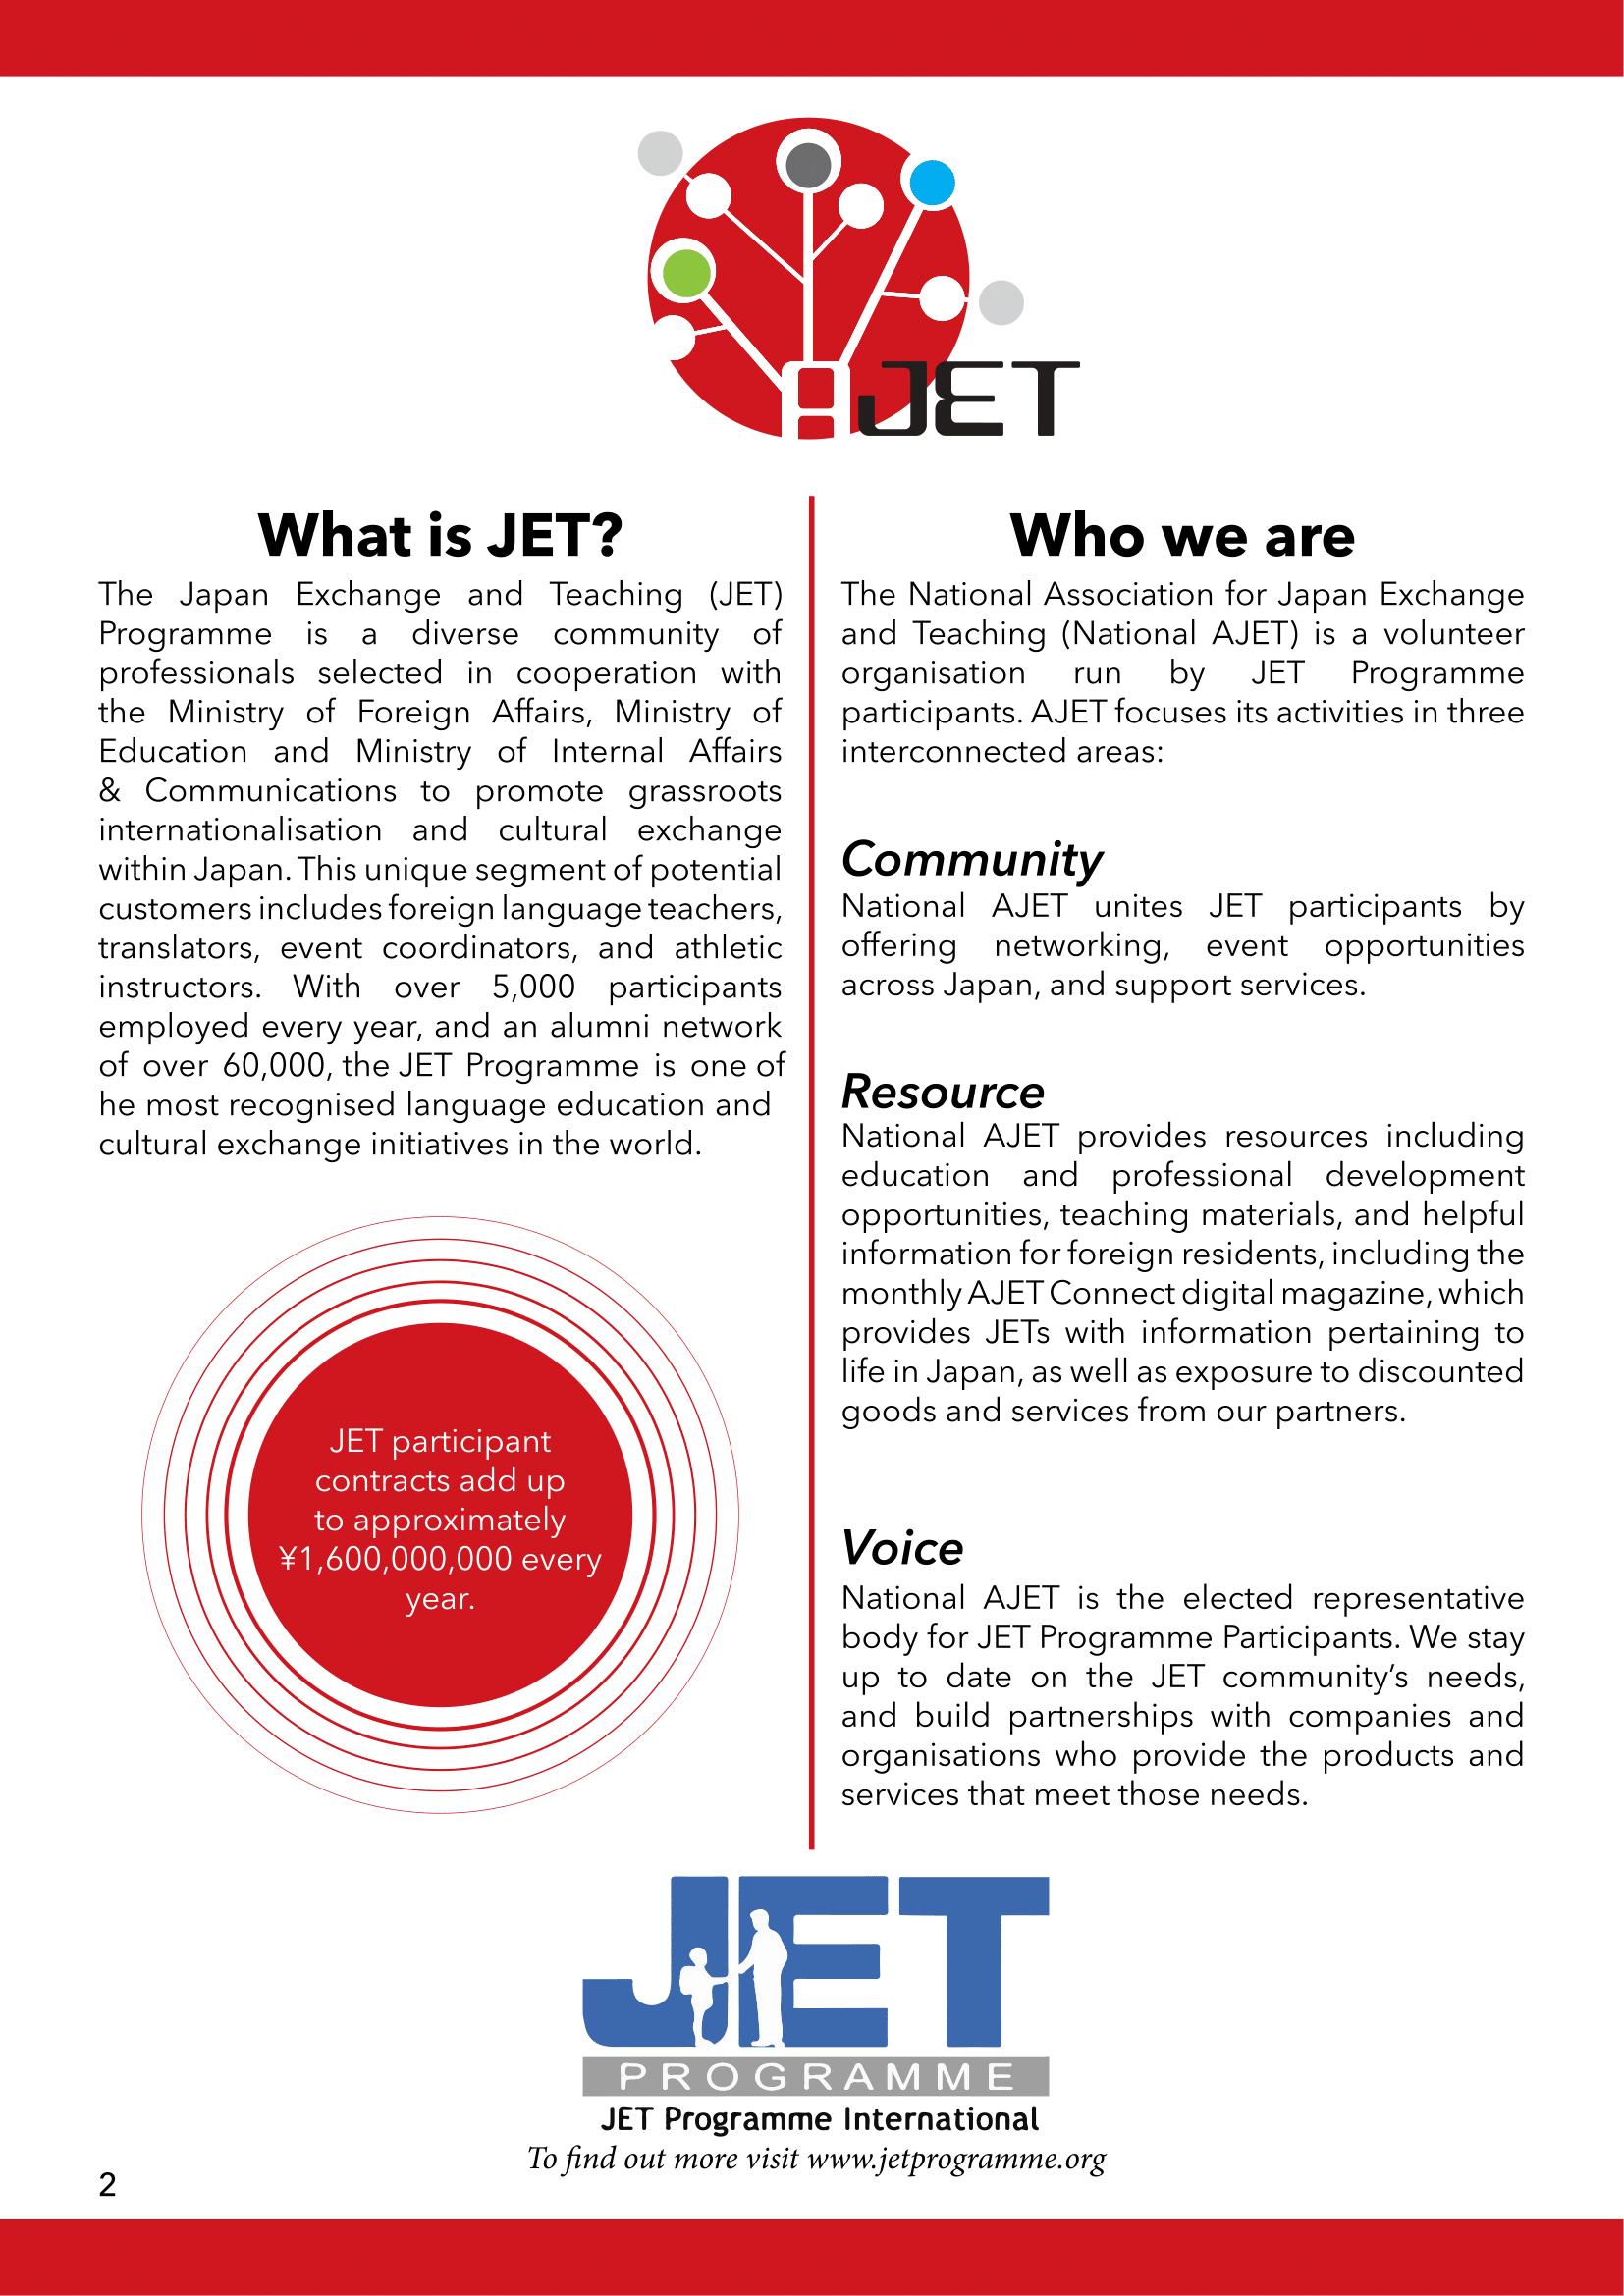 jet programme dating